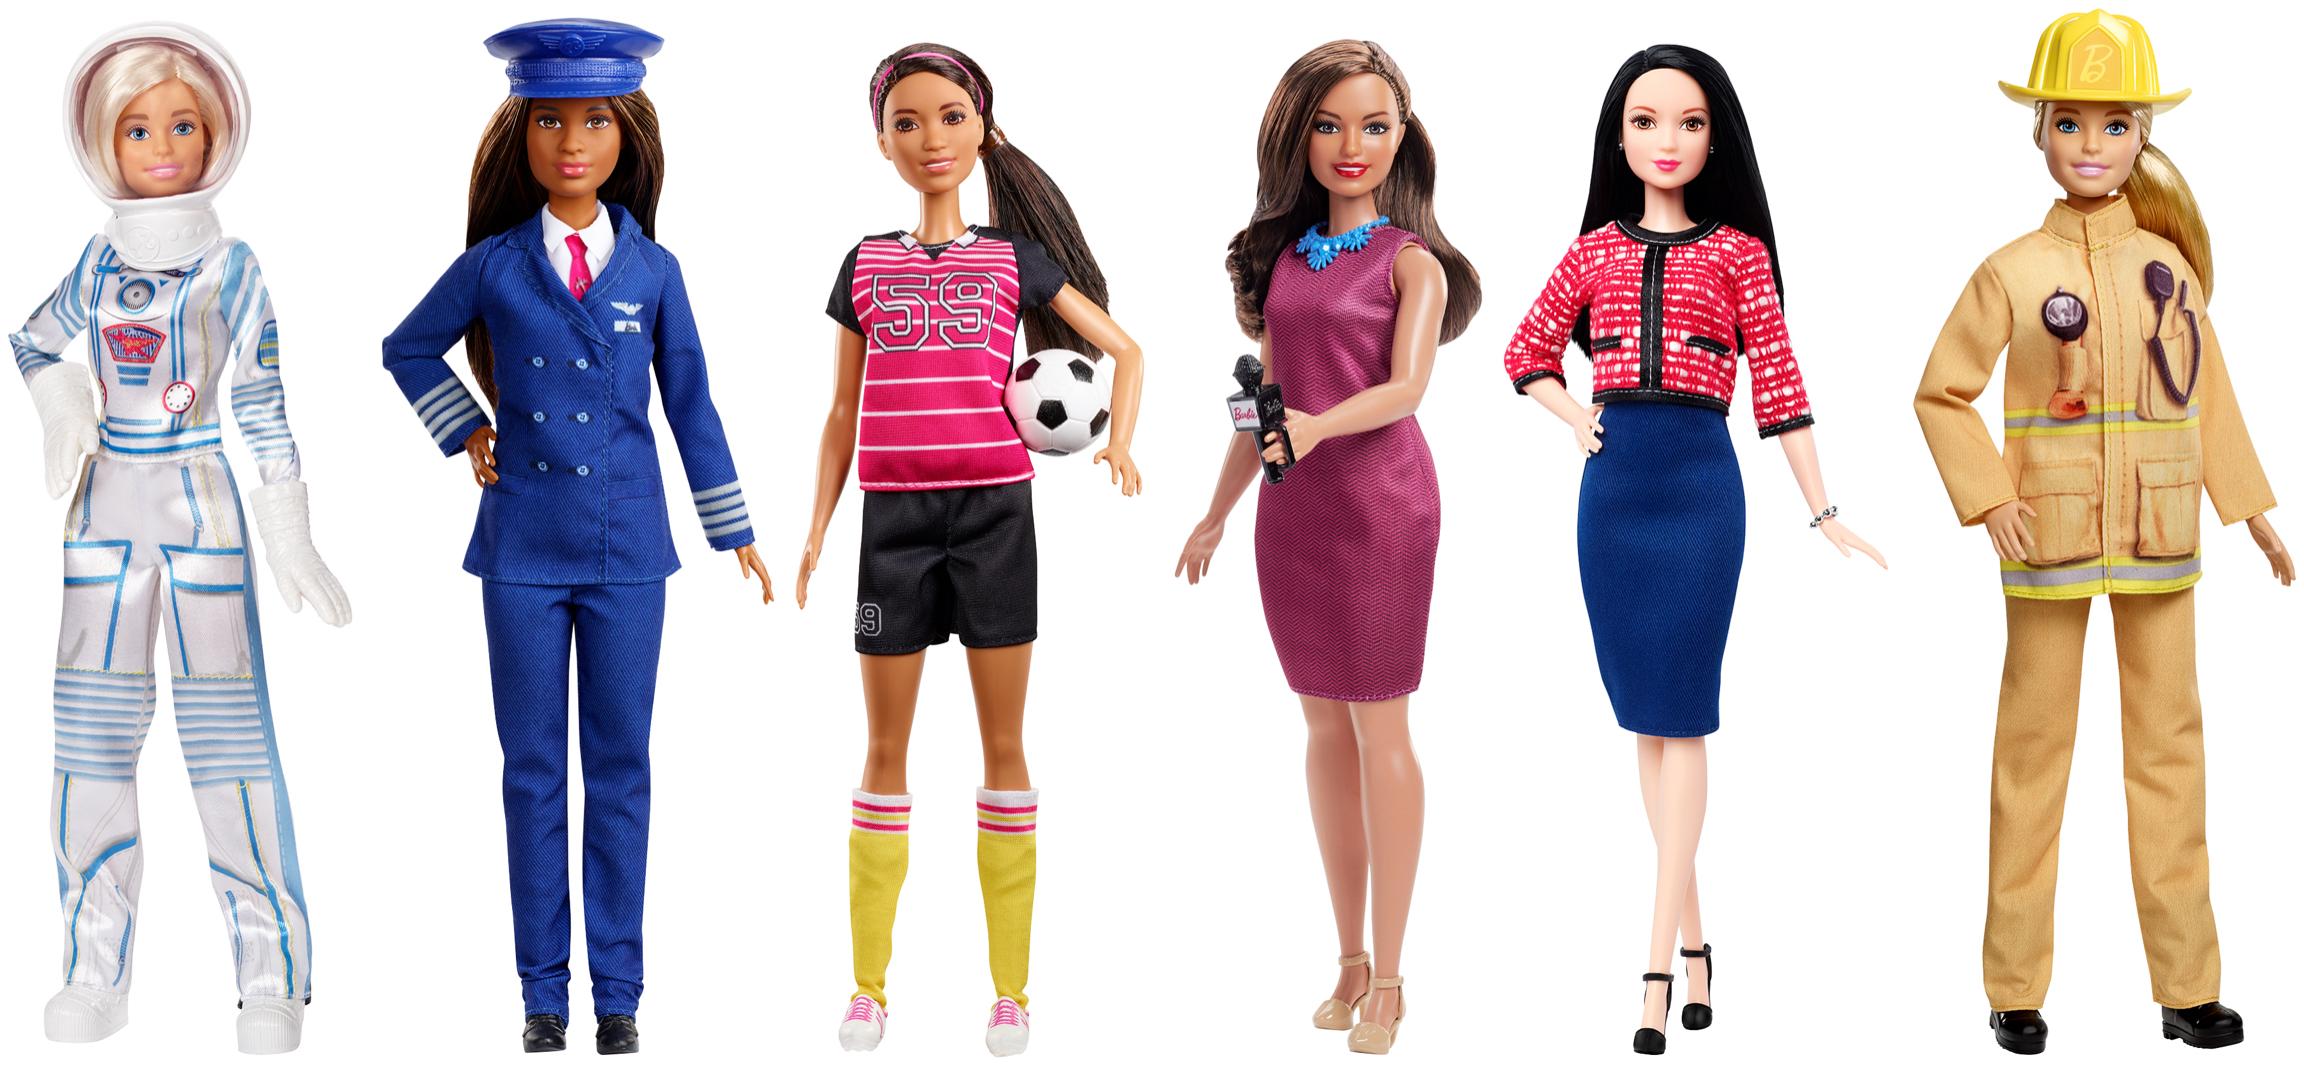 Barbie 'Be Anything' Tour Kicks Off In Northwest Arkansas